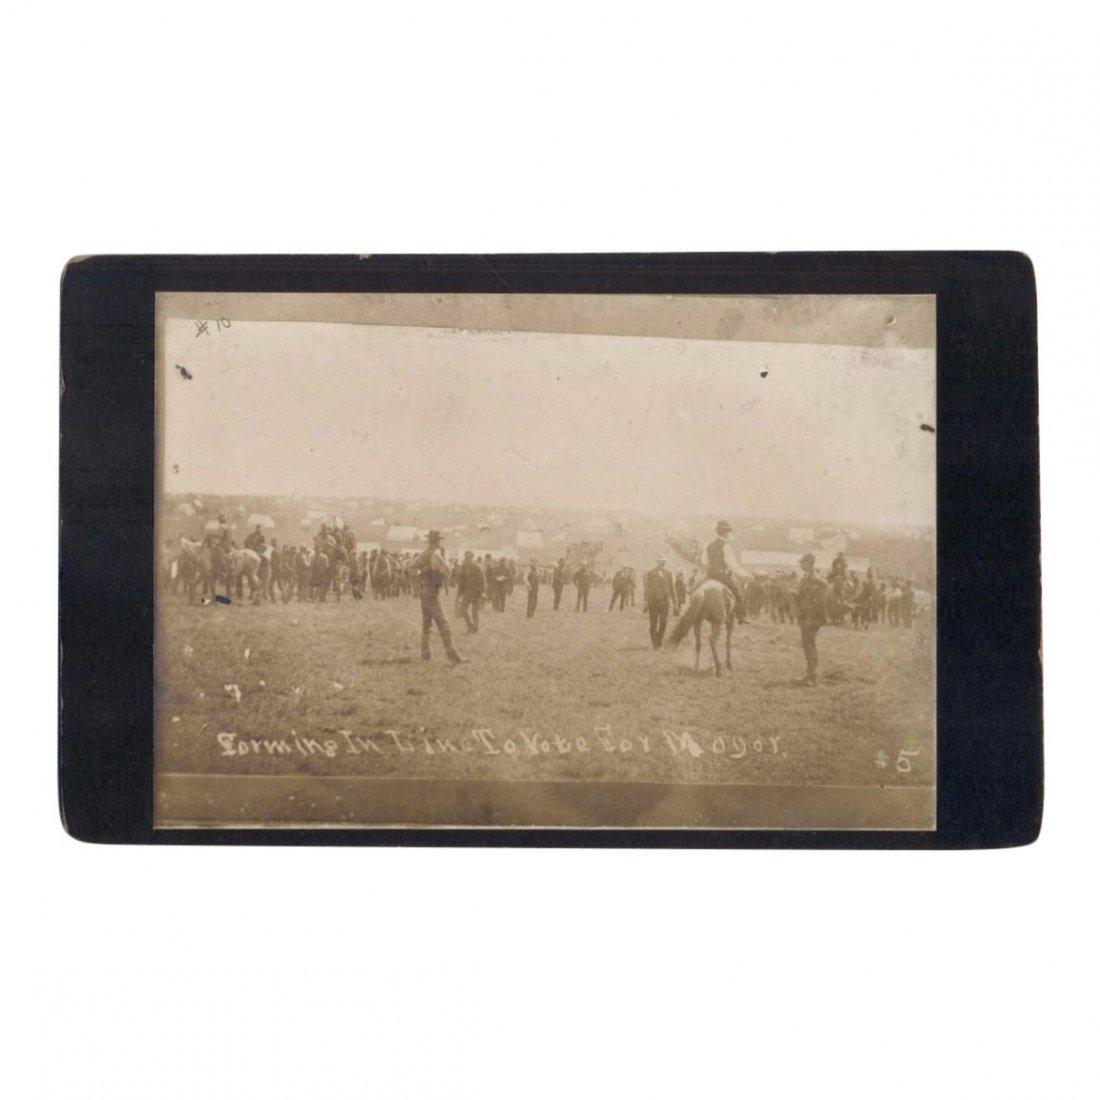 Oklahoma Land Rush Camp Cabinet Card Photograph, 1889